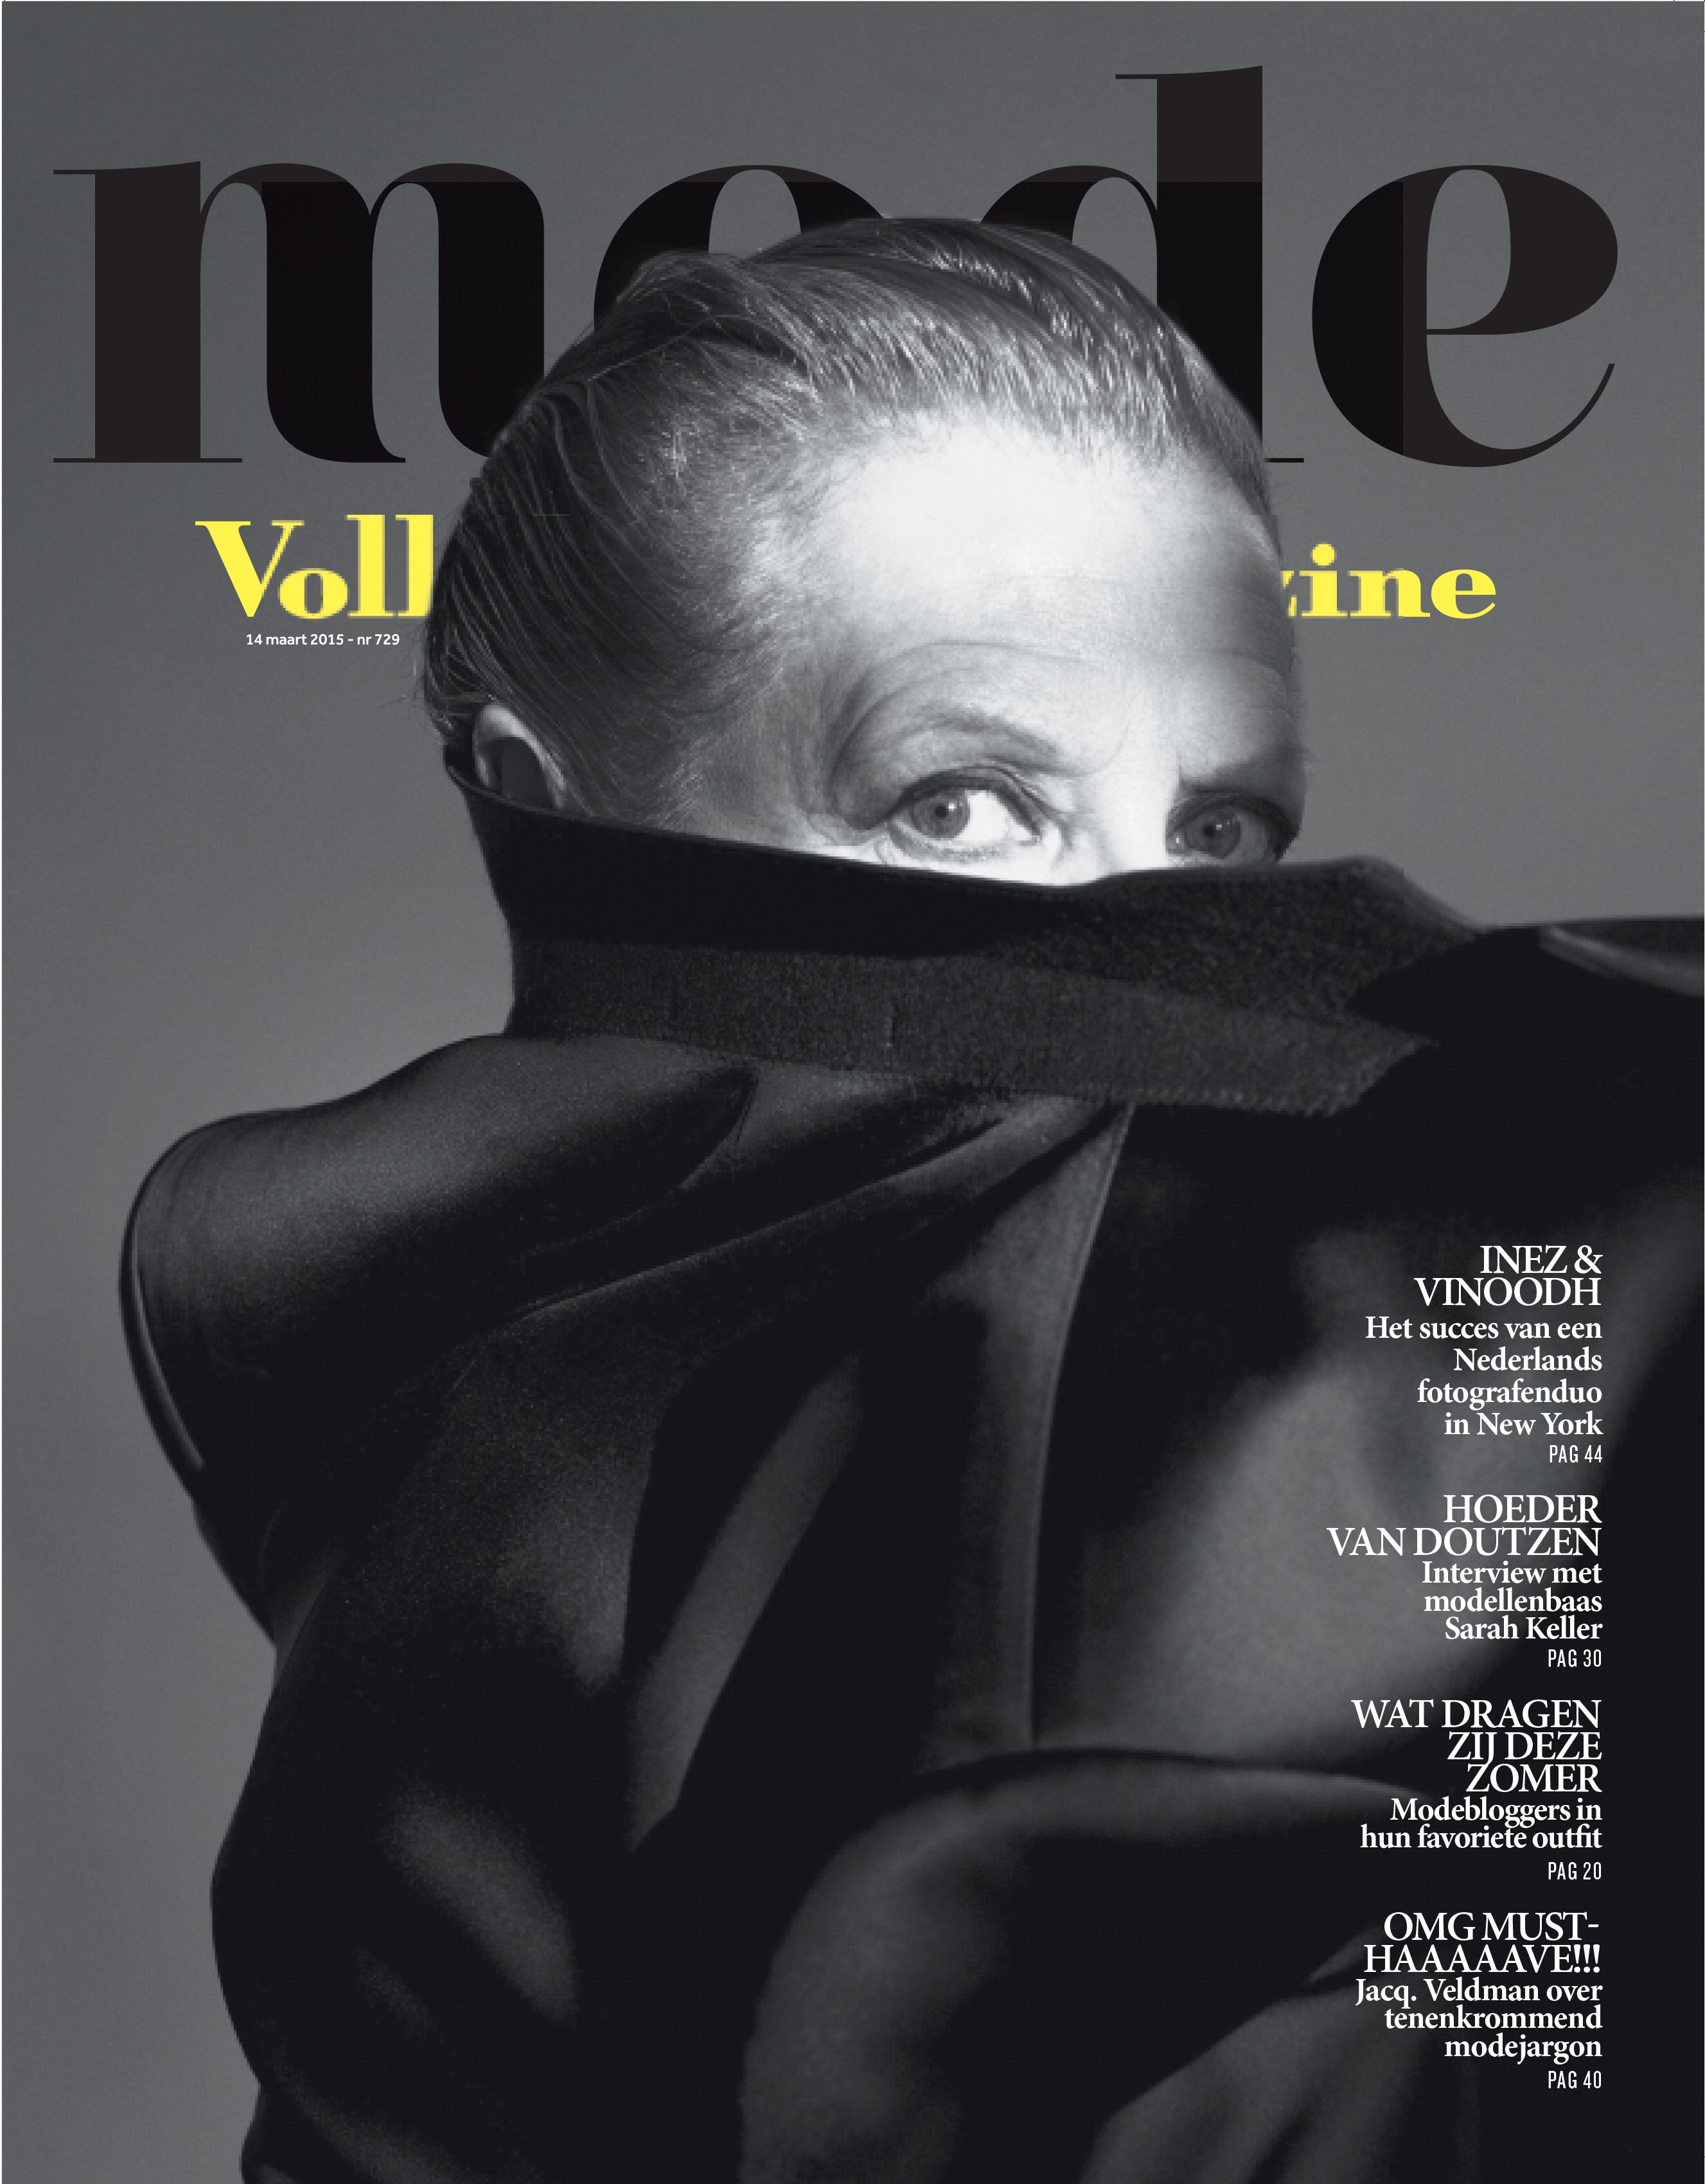 Оформление обложки журнала фото